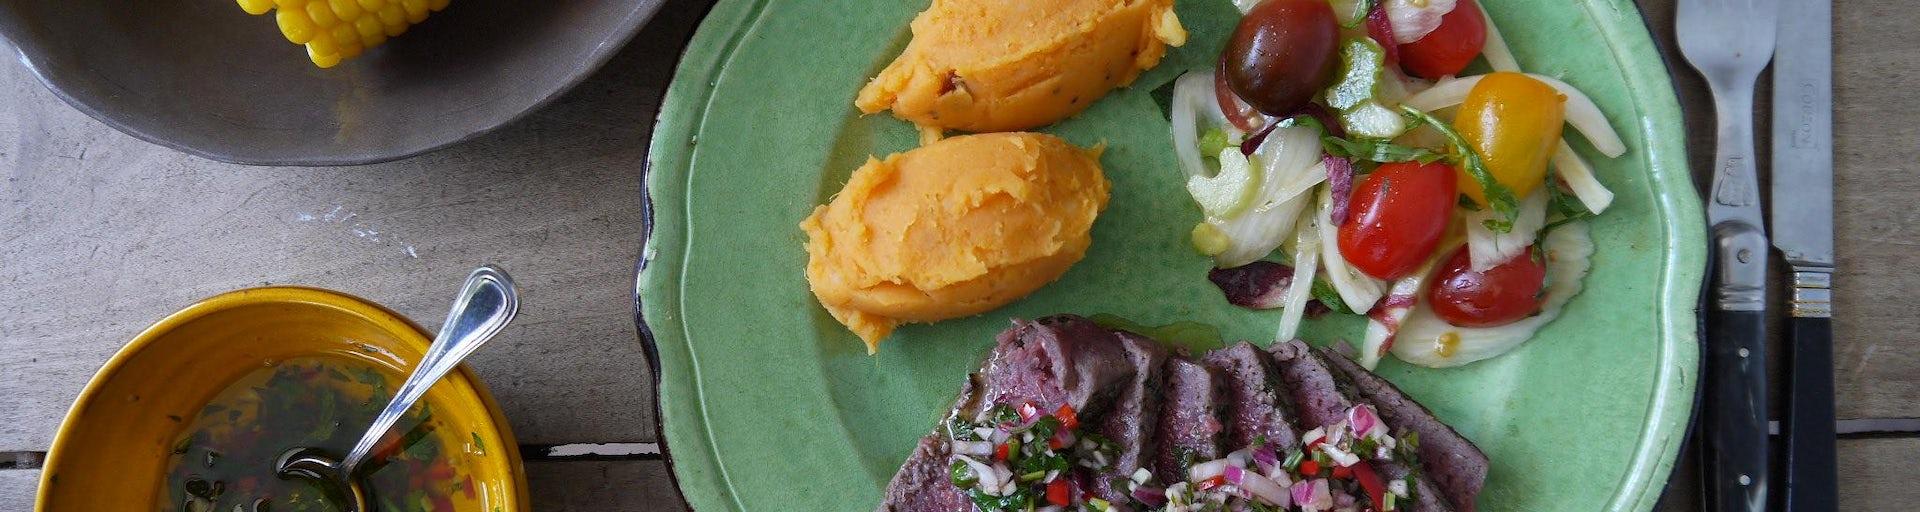 Wk 41 duitse biefstuk chimichuri mais bataat puree